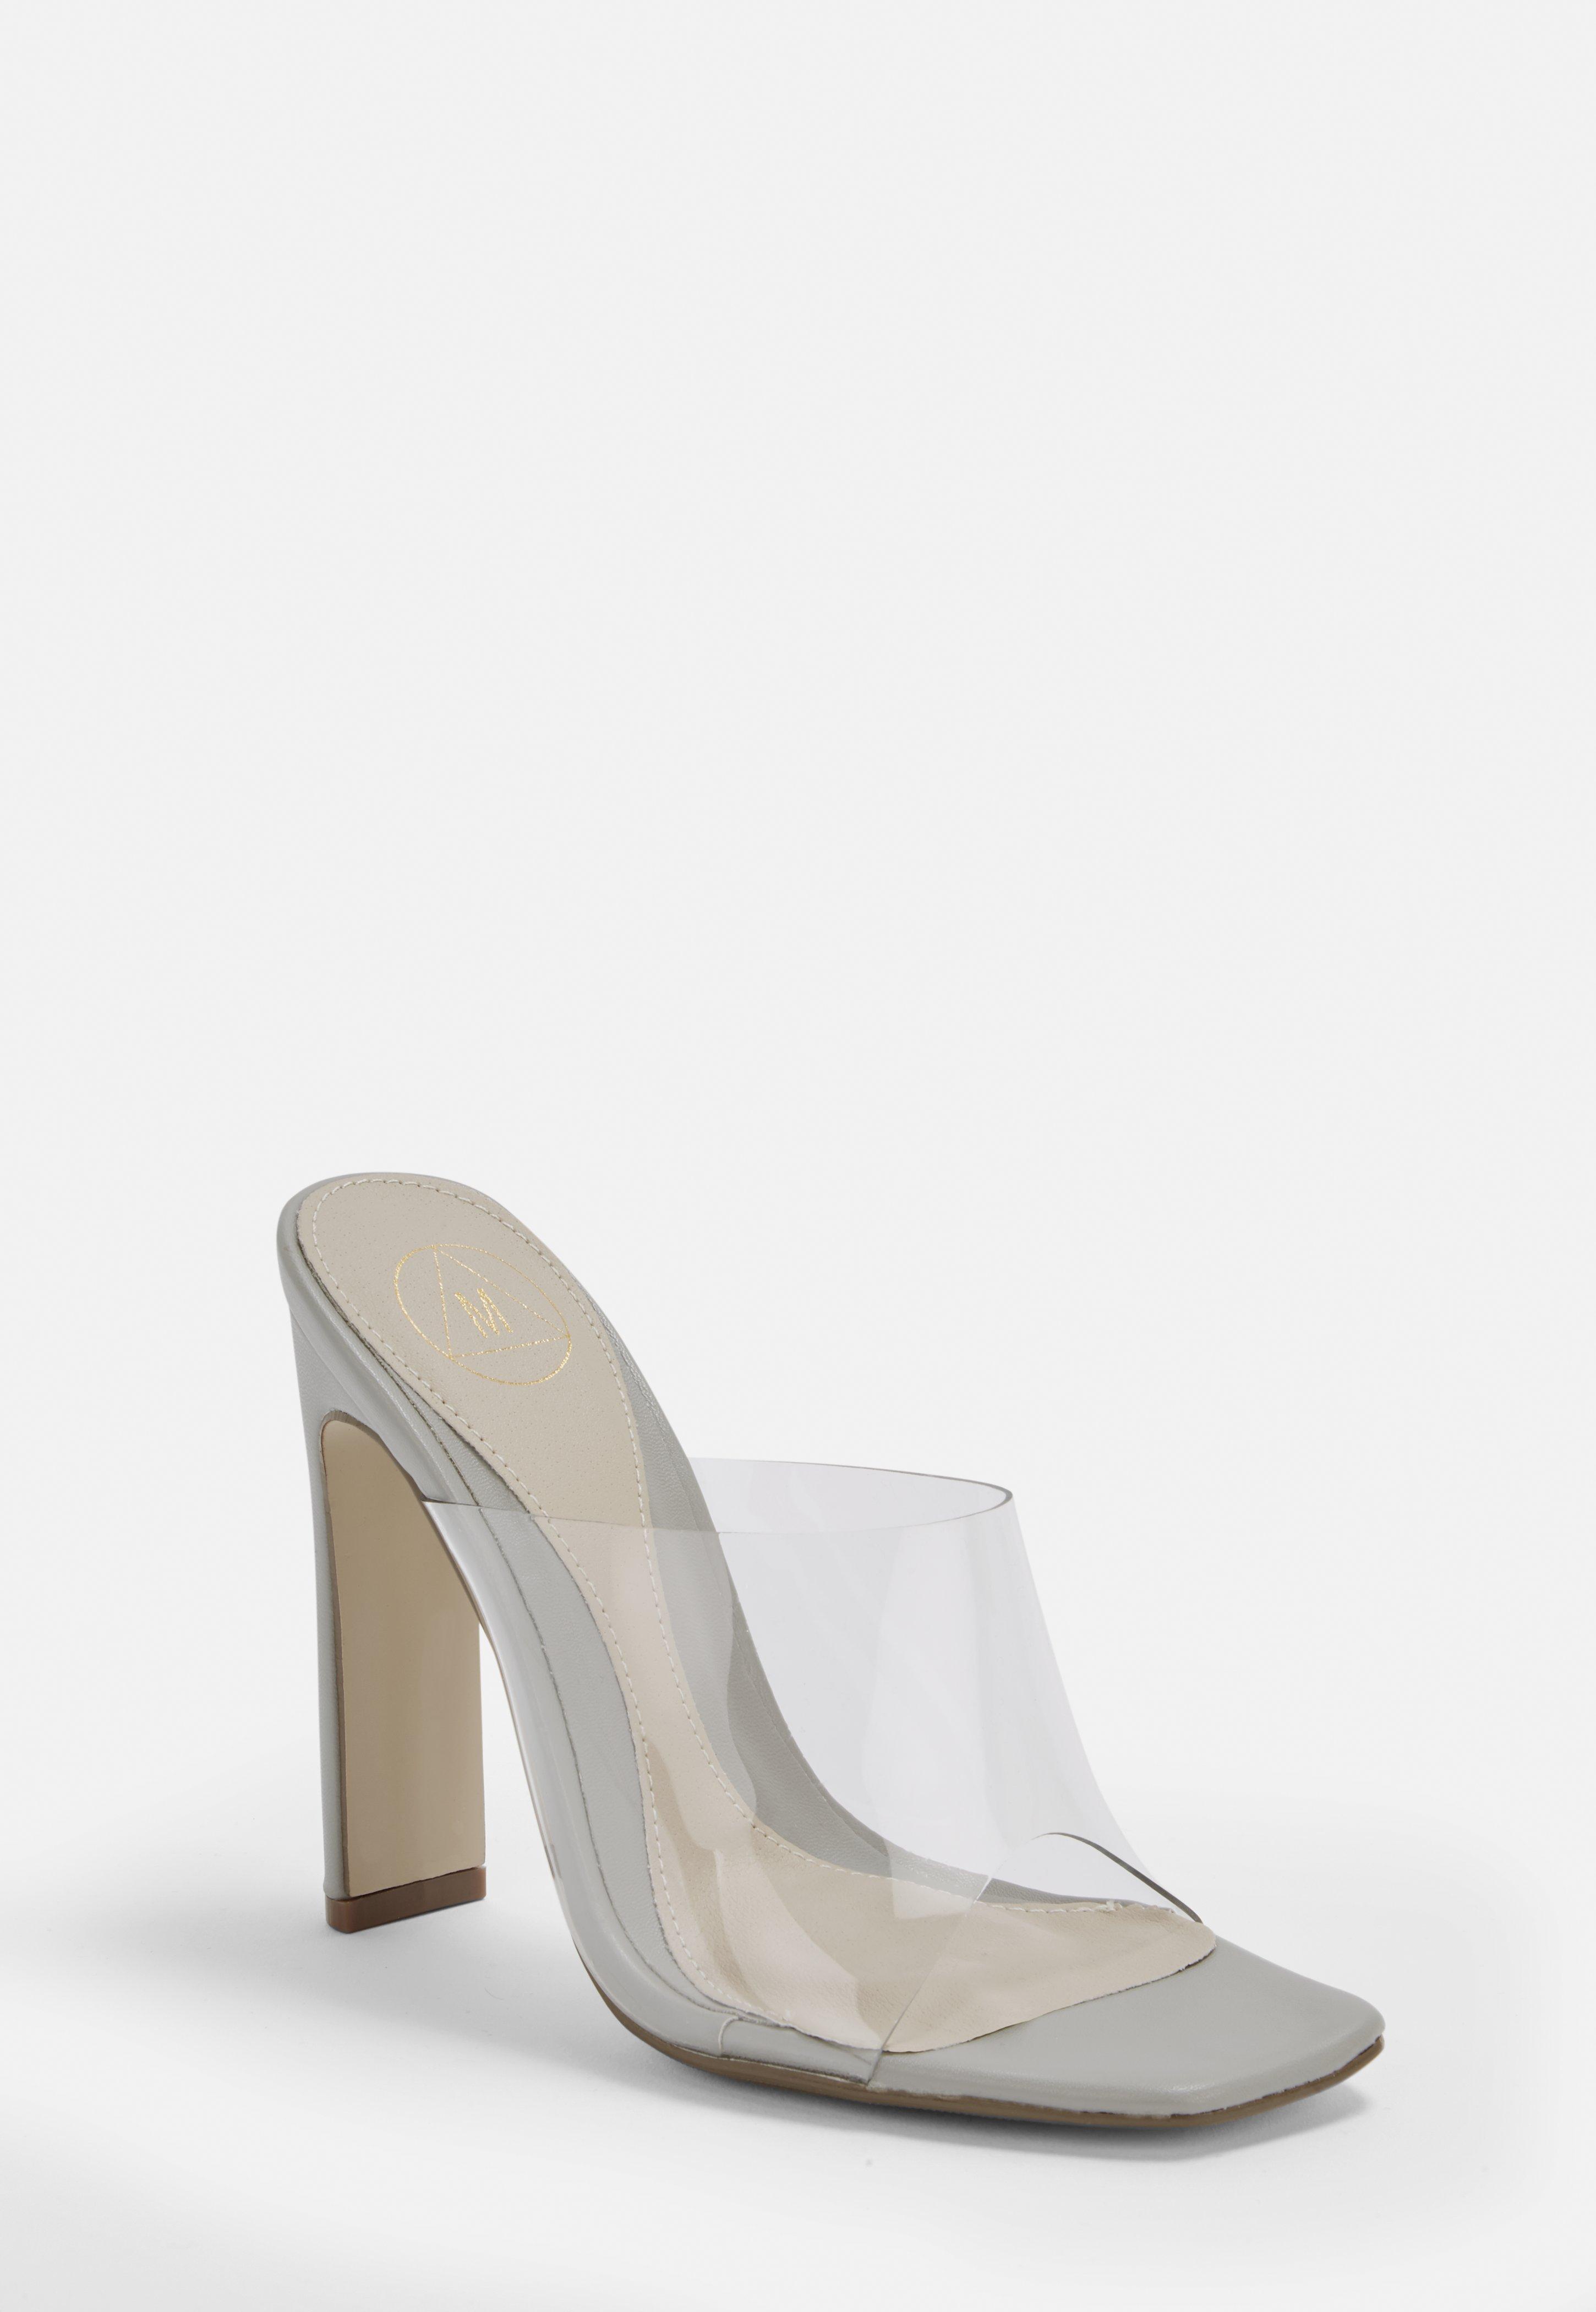 d15c1a1272 Clear Heels - Shoes